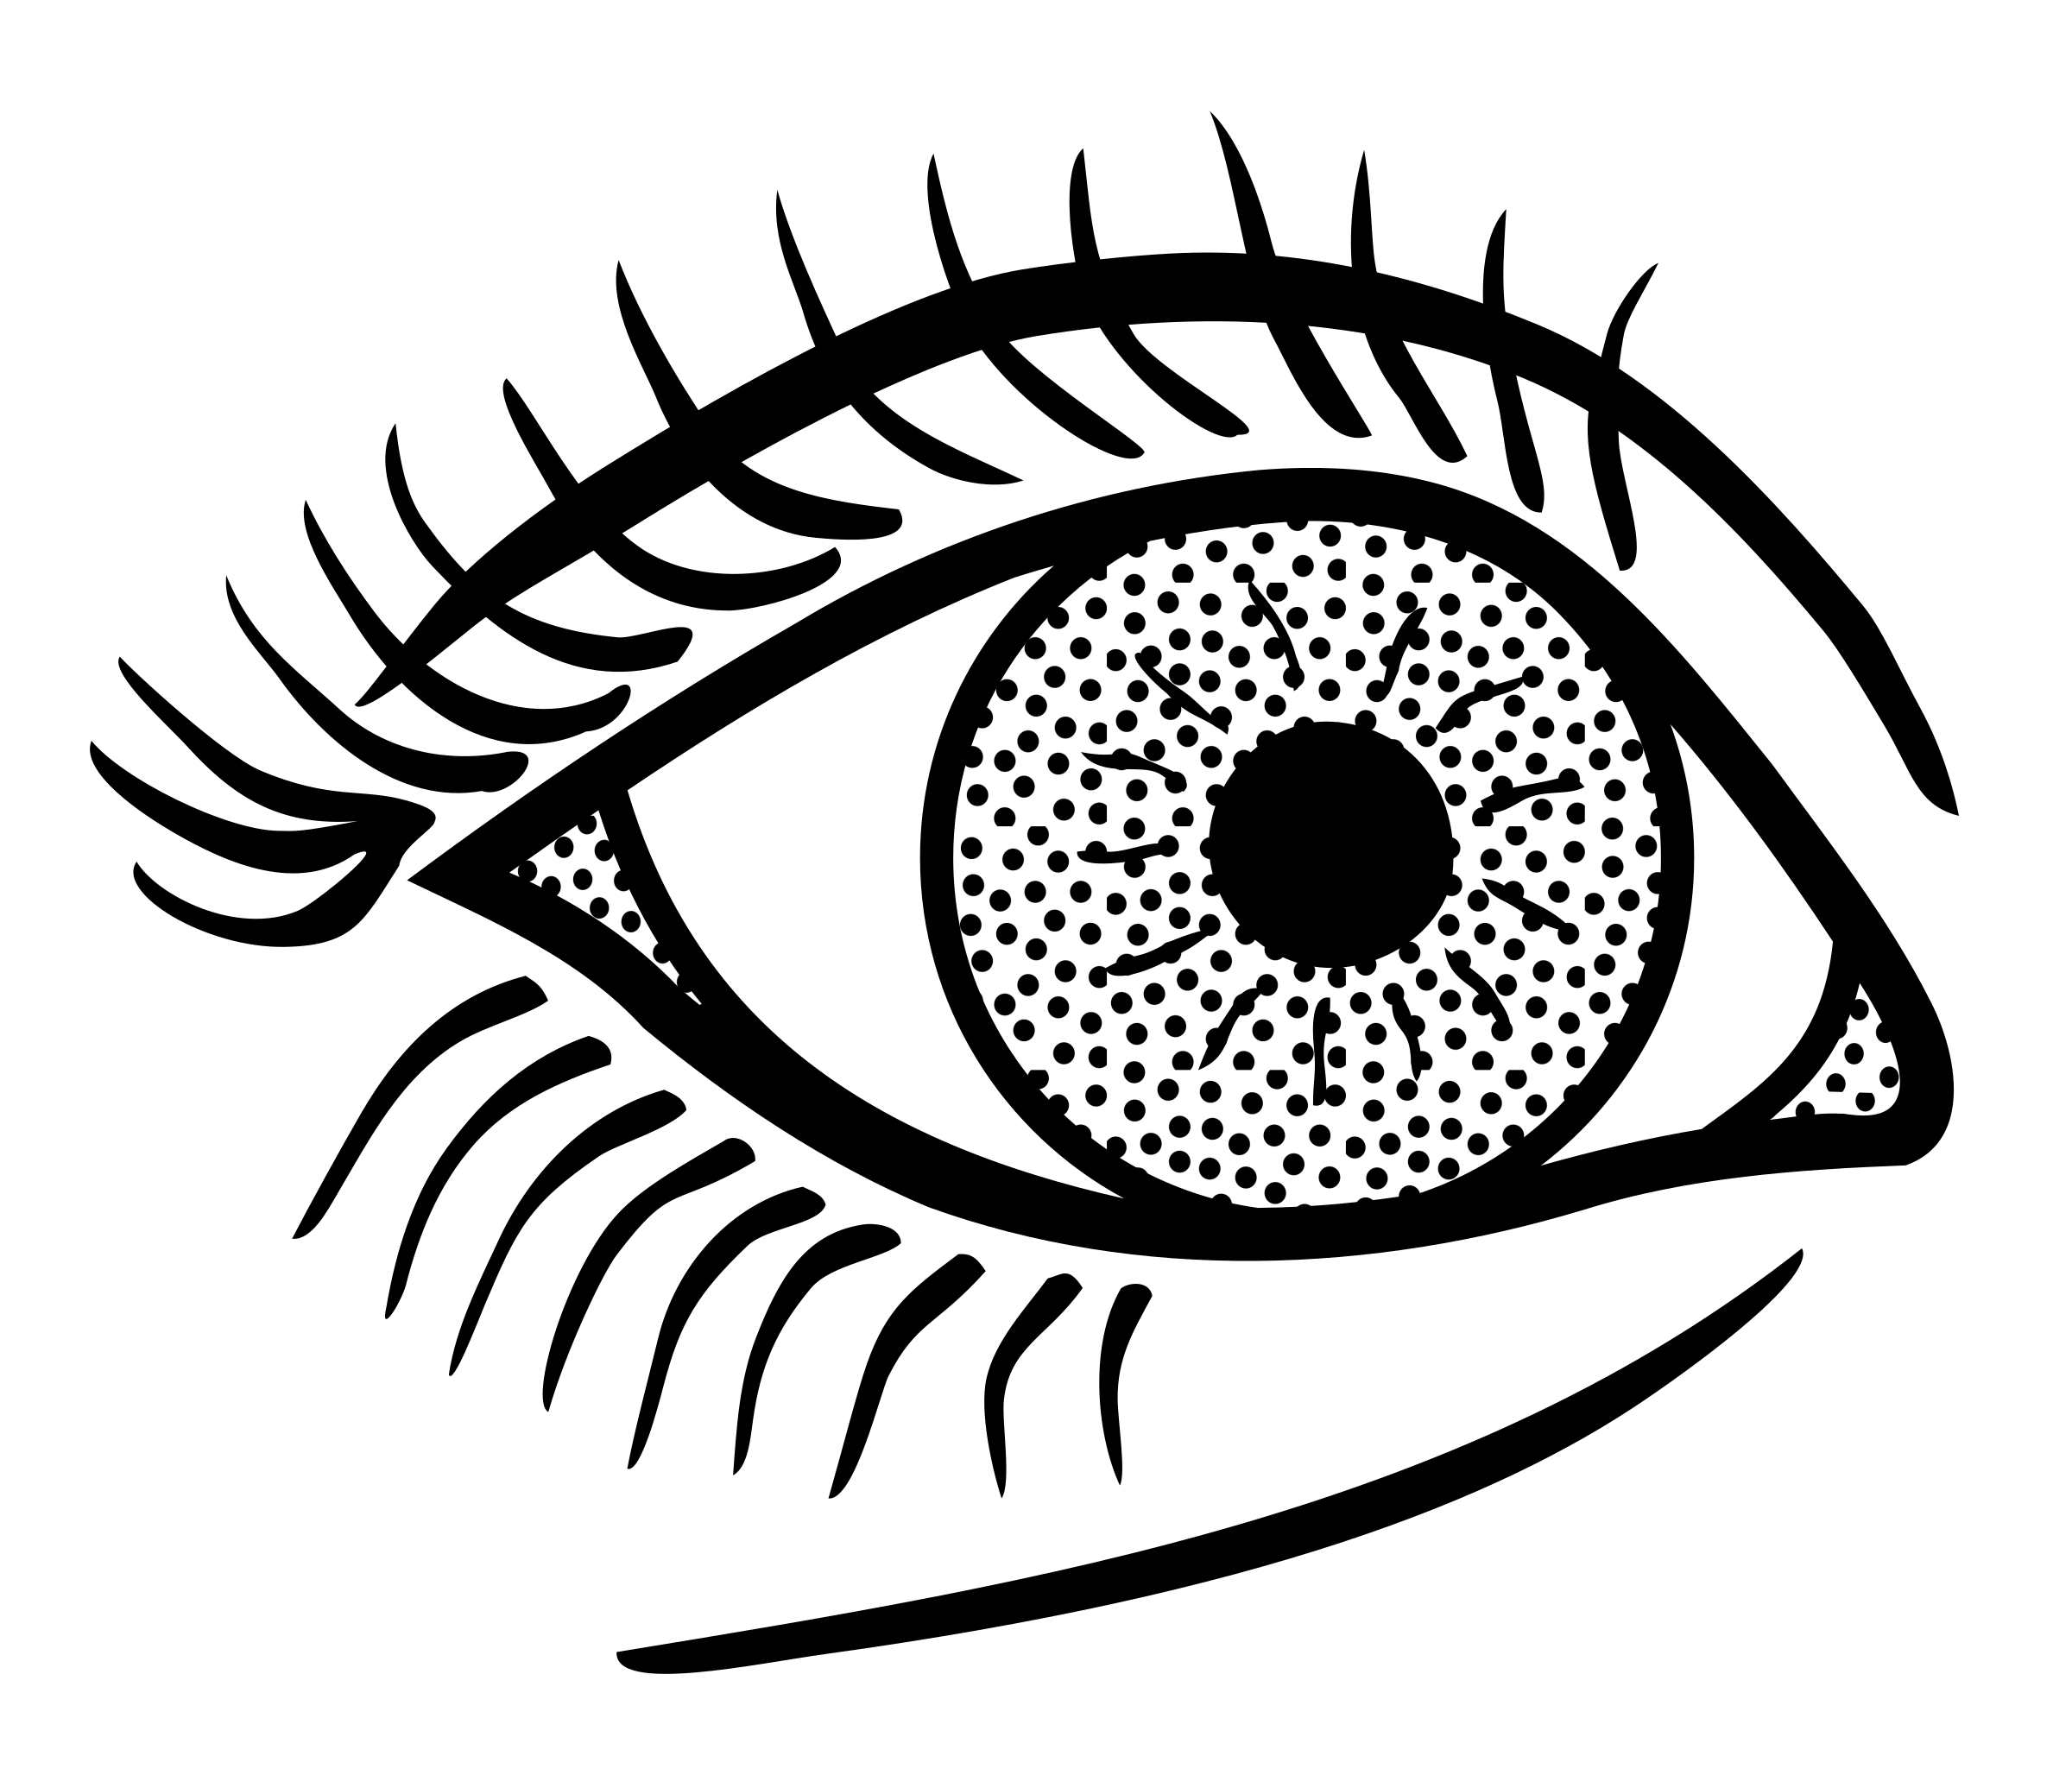 Clipart eye line art. Lineart big image png